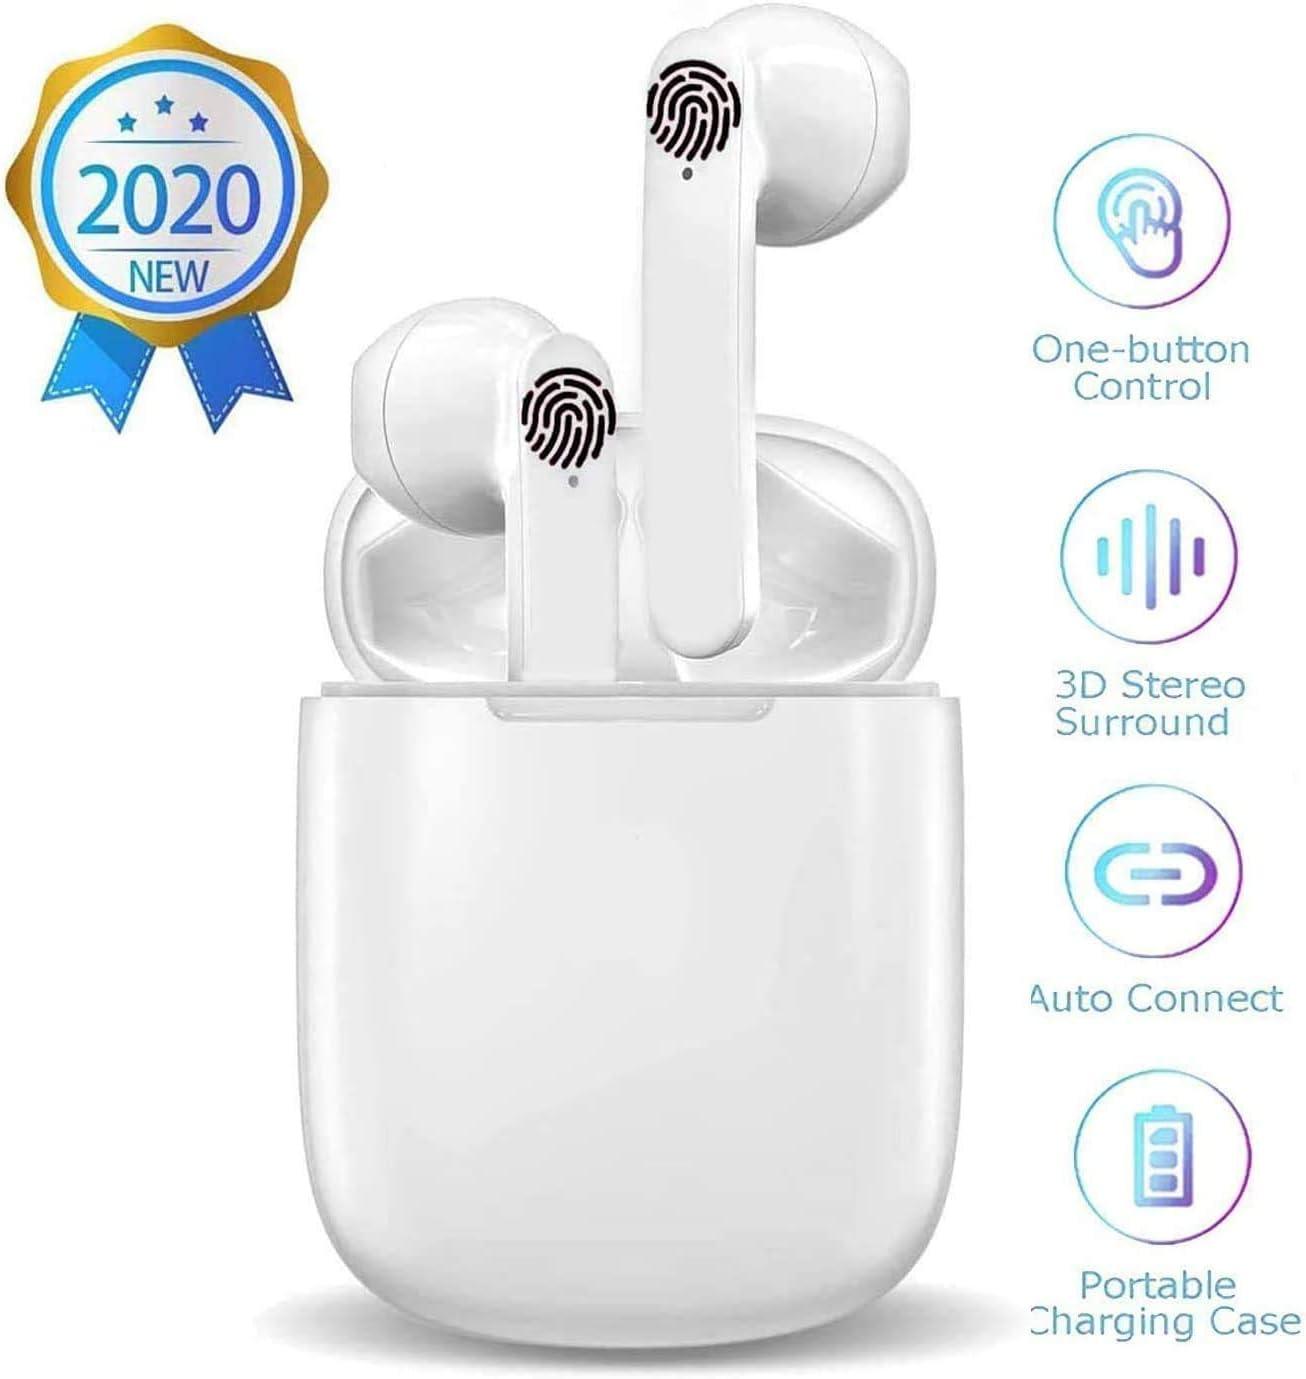 Auriculares Bluetooth 5 Auricular Inalámbrico reducción de Ruido estéreo 3D HD Control Táctil Auriculares In-Ear IPX5 Impermeables Sport Auriculares para Android/iPhone/Samsung